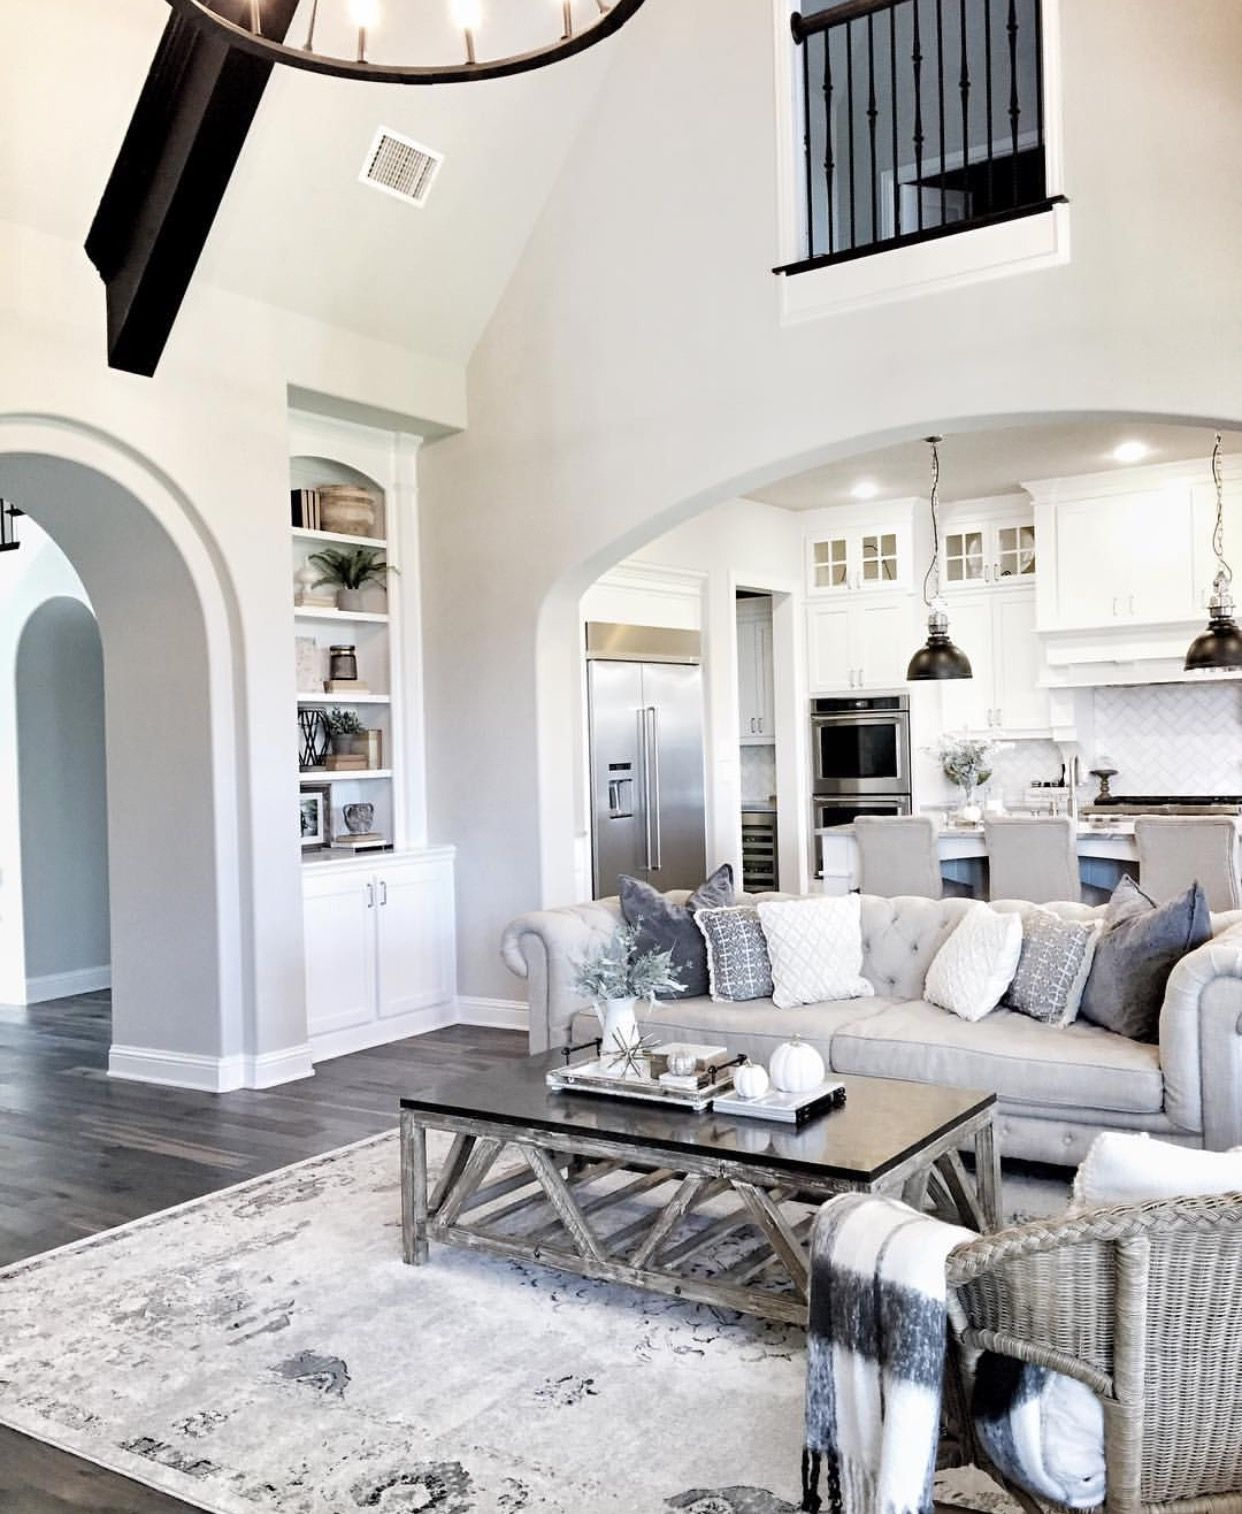 Living Room Designs, Living Rooms, Family Rooms, Home Design, Interior  Design, 3 Kids, Paint Colors, Home Decor Ideas, Dallas